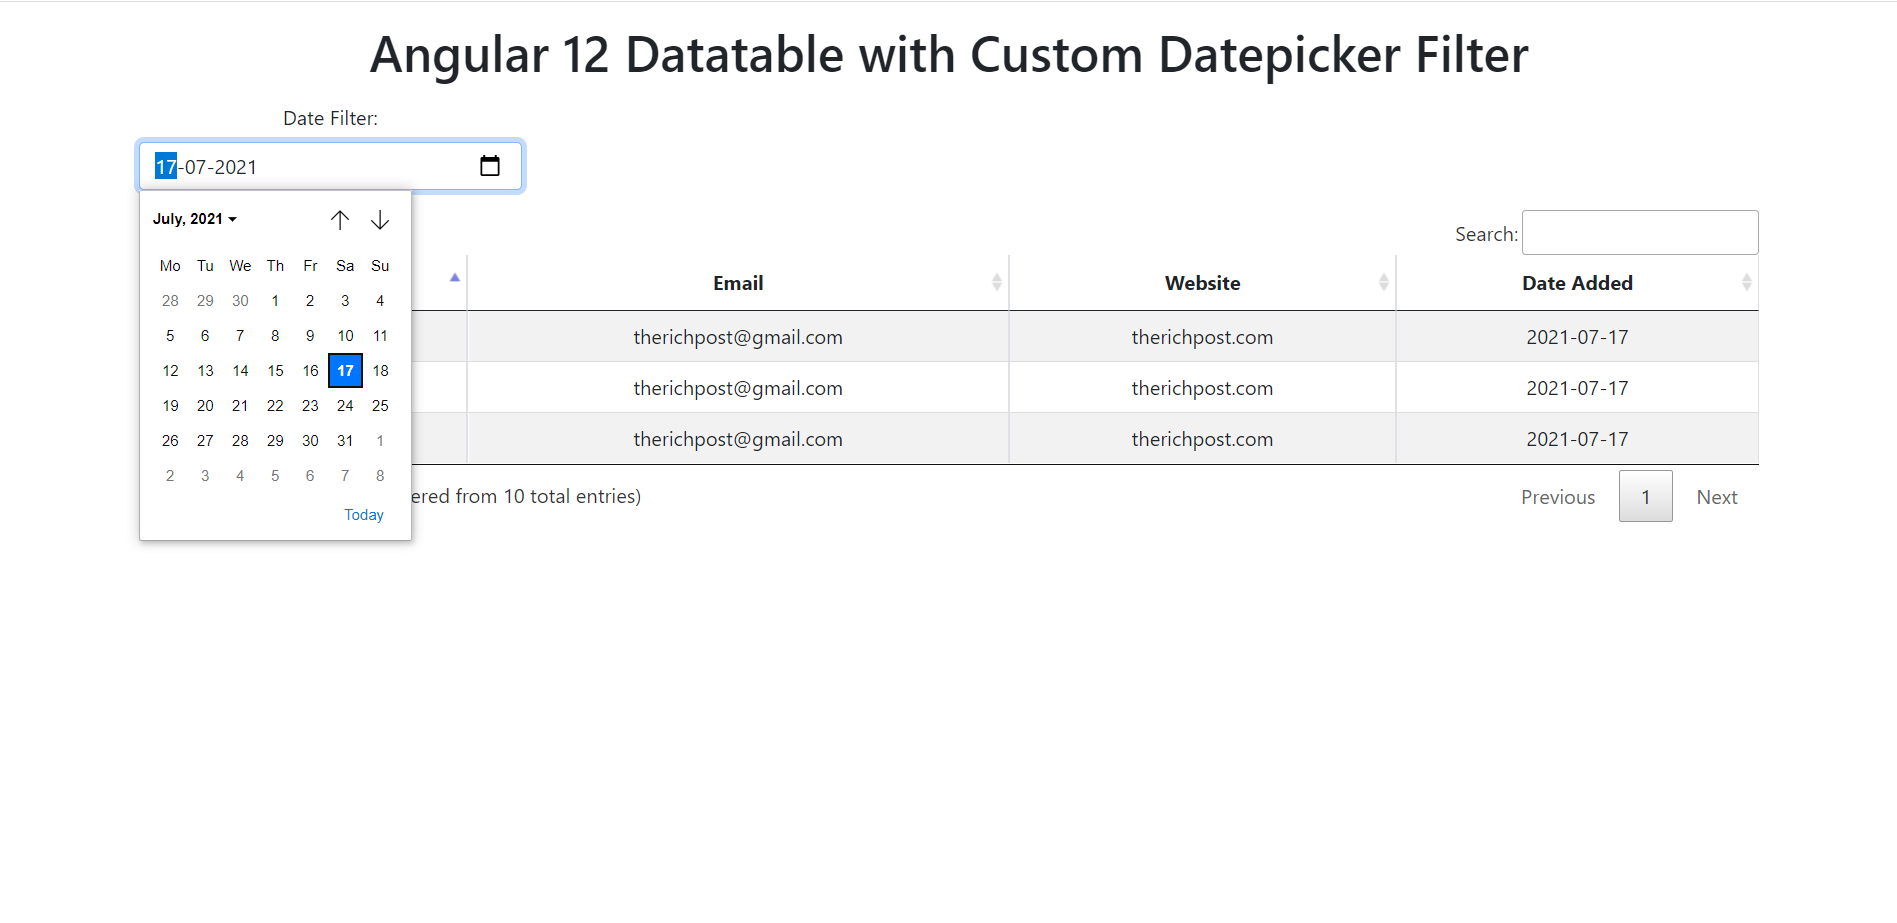 Angular 12 Datatable with custom DatePicker Filter